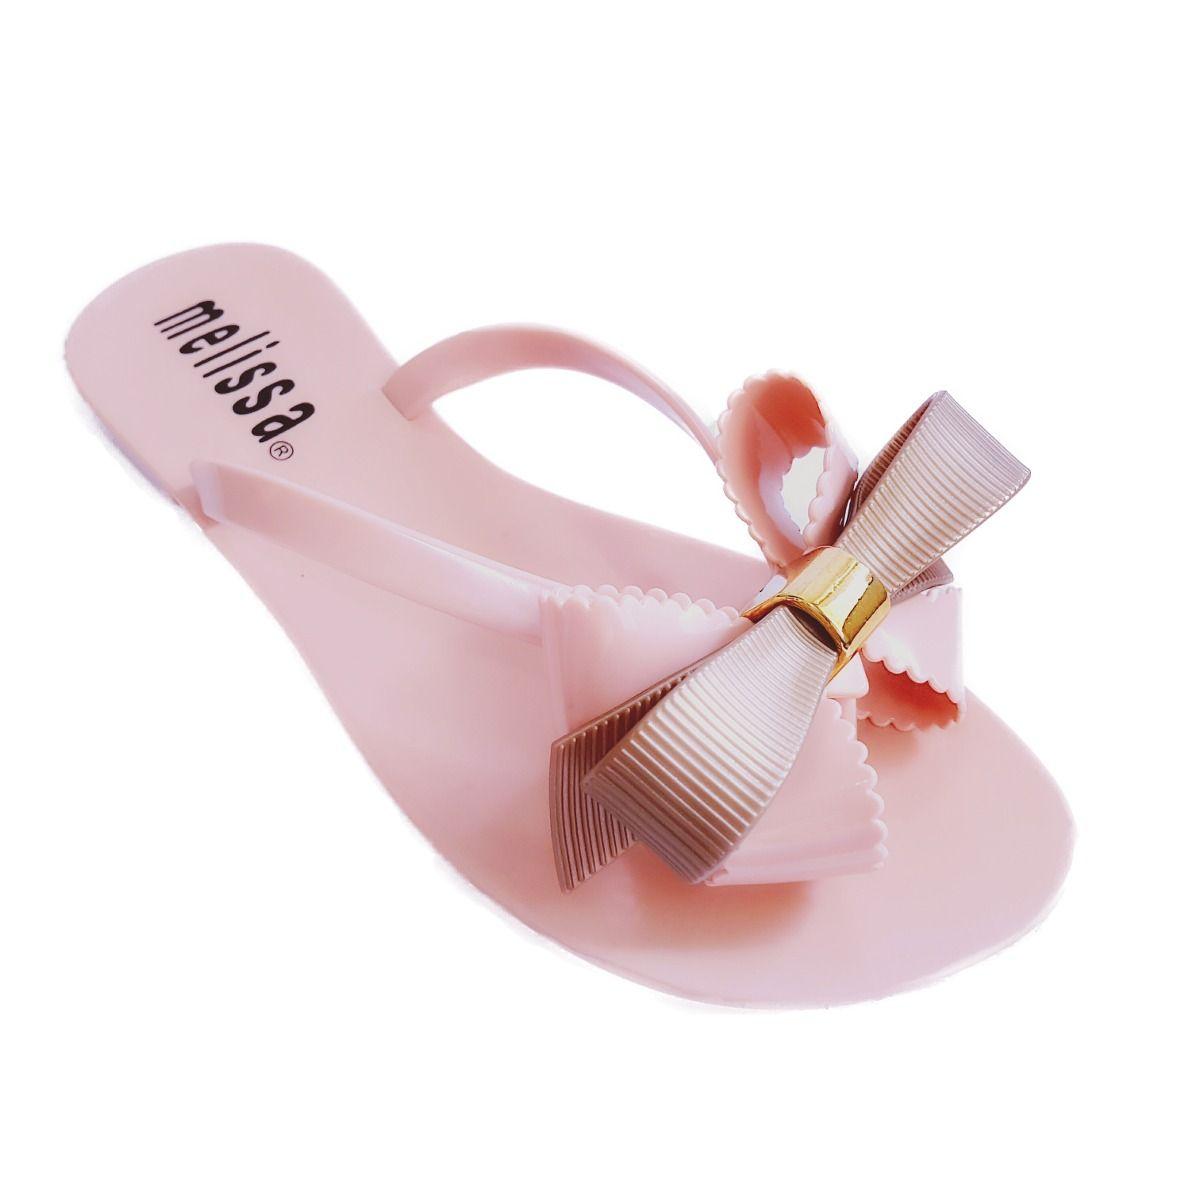 060b13ba2e3 chinelo rasteira sandália rasteirinha feminina melissa xii